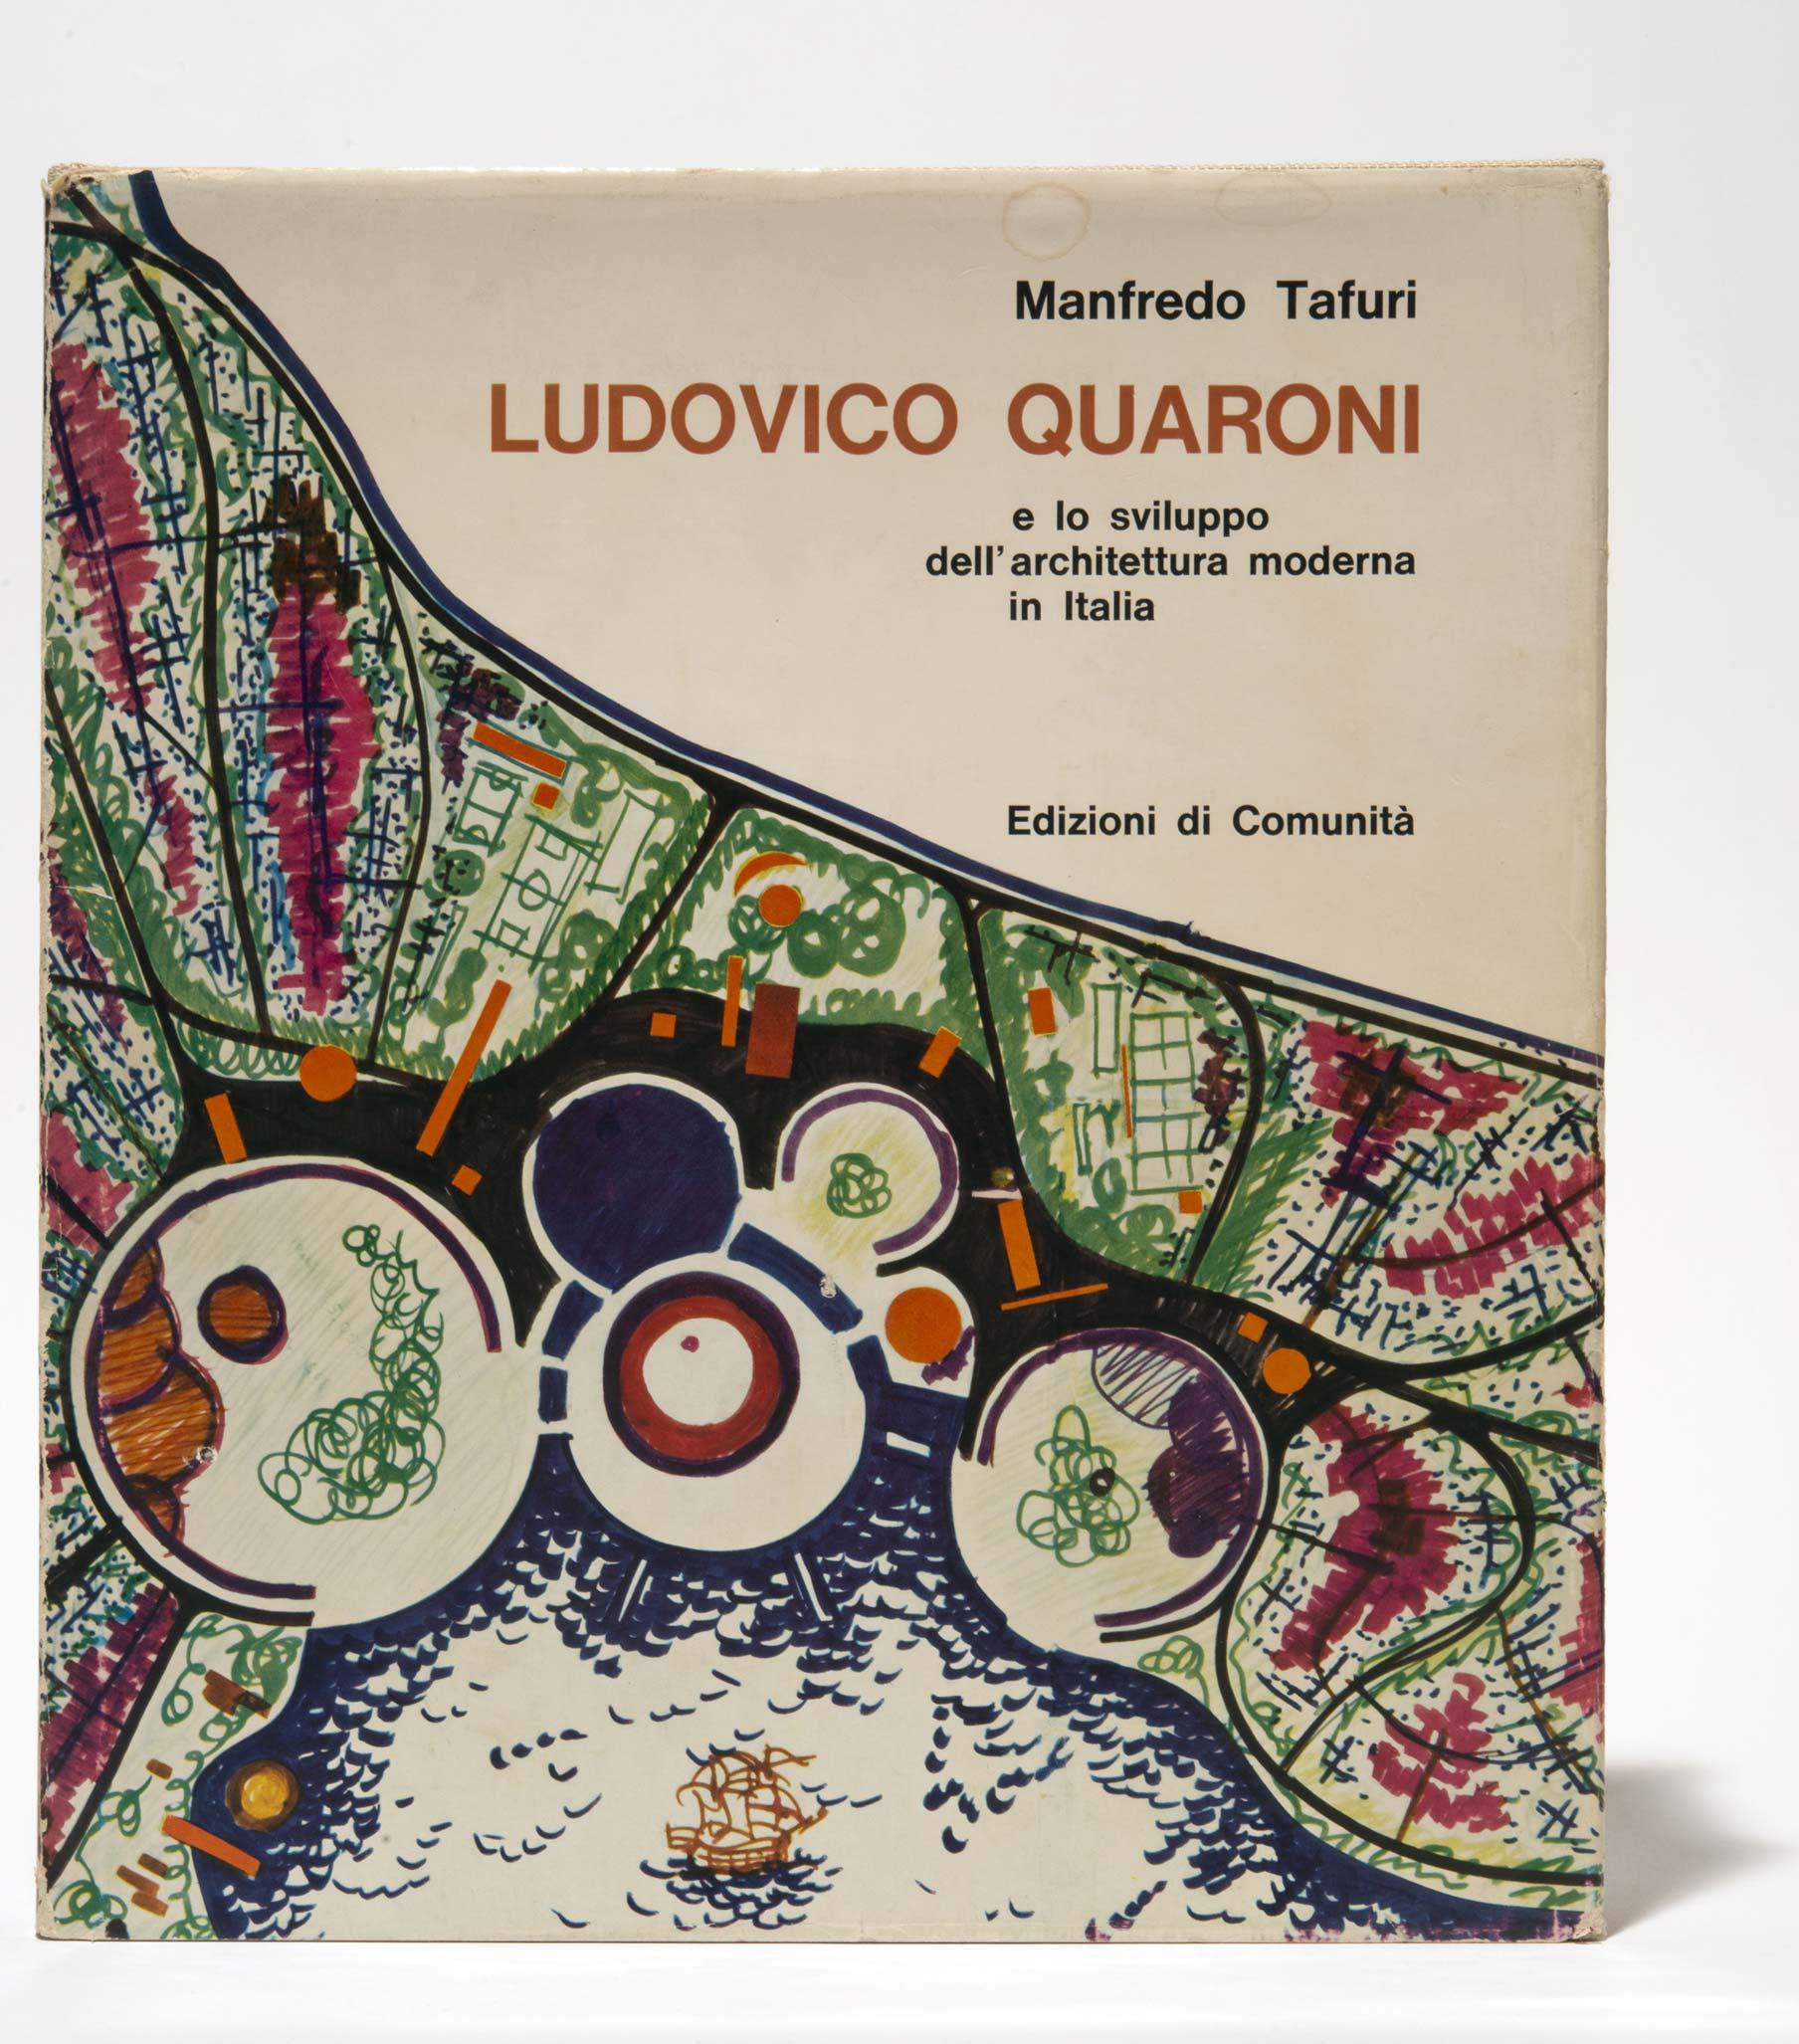 Copertina Manfredo Tafuri Ludovico Quaroni